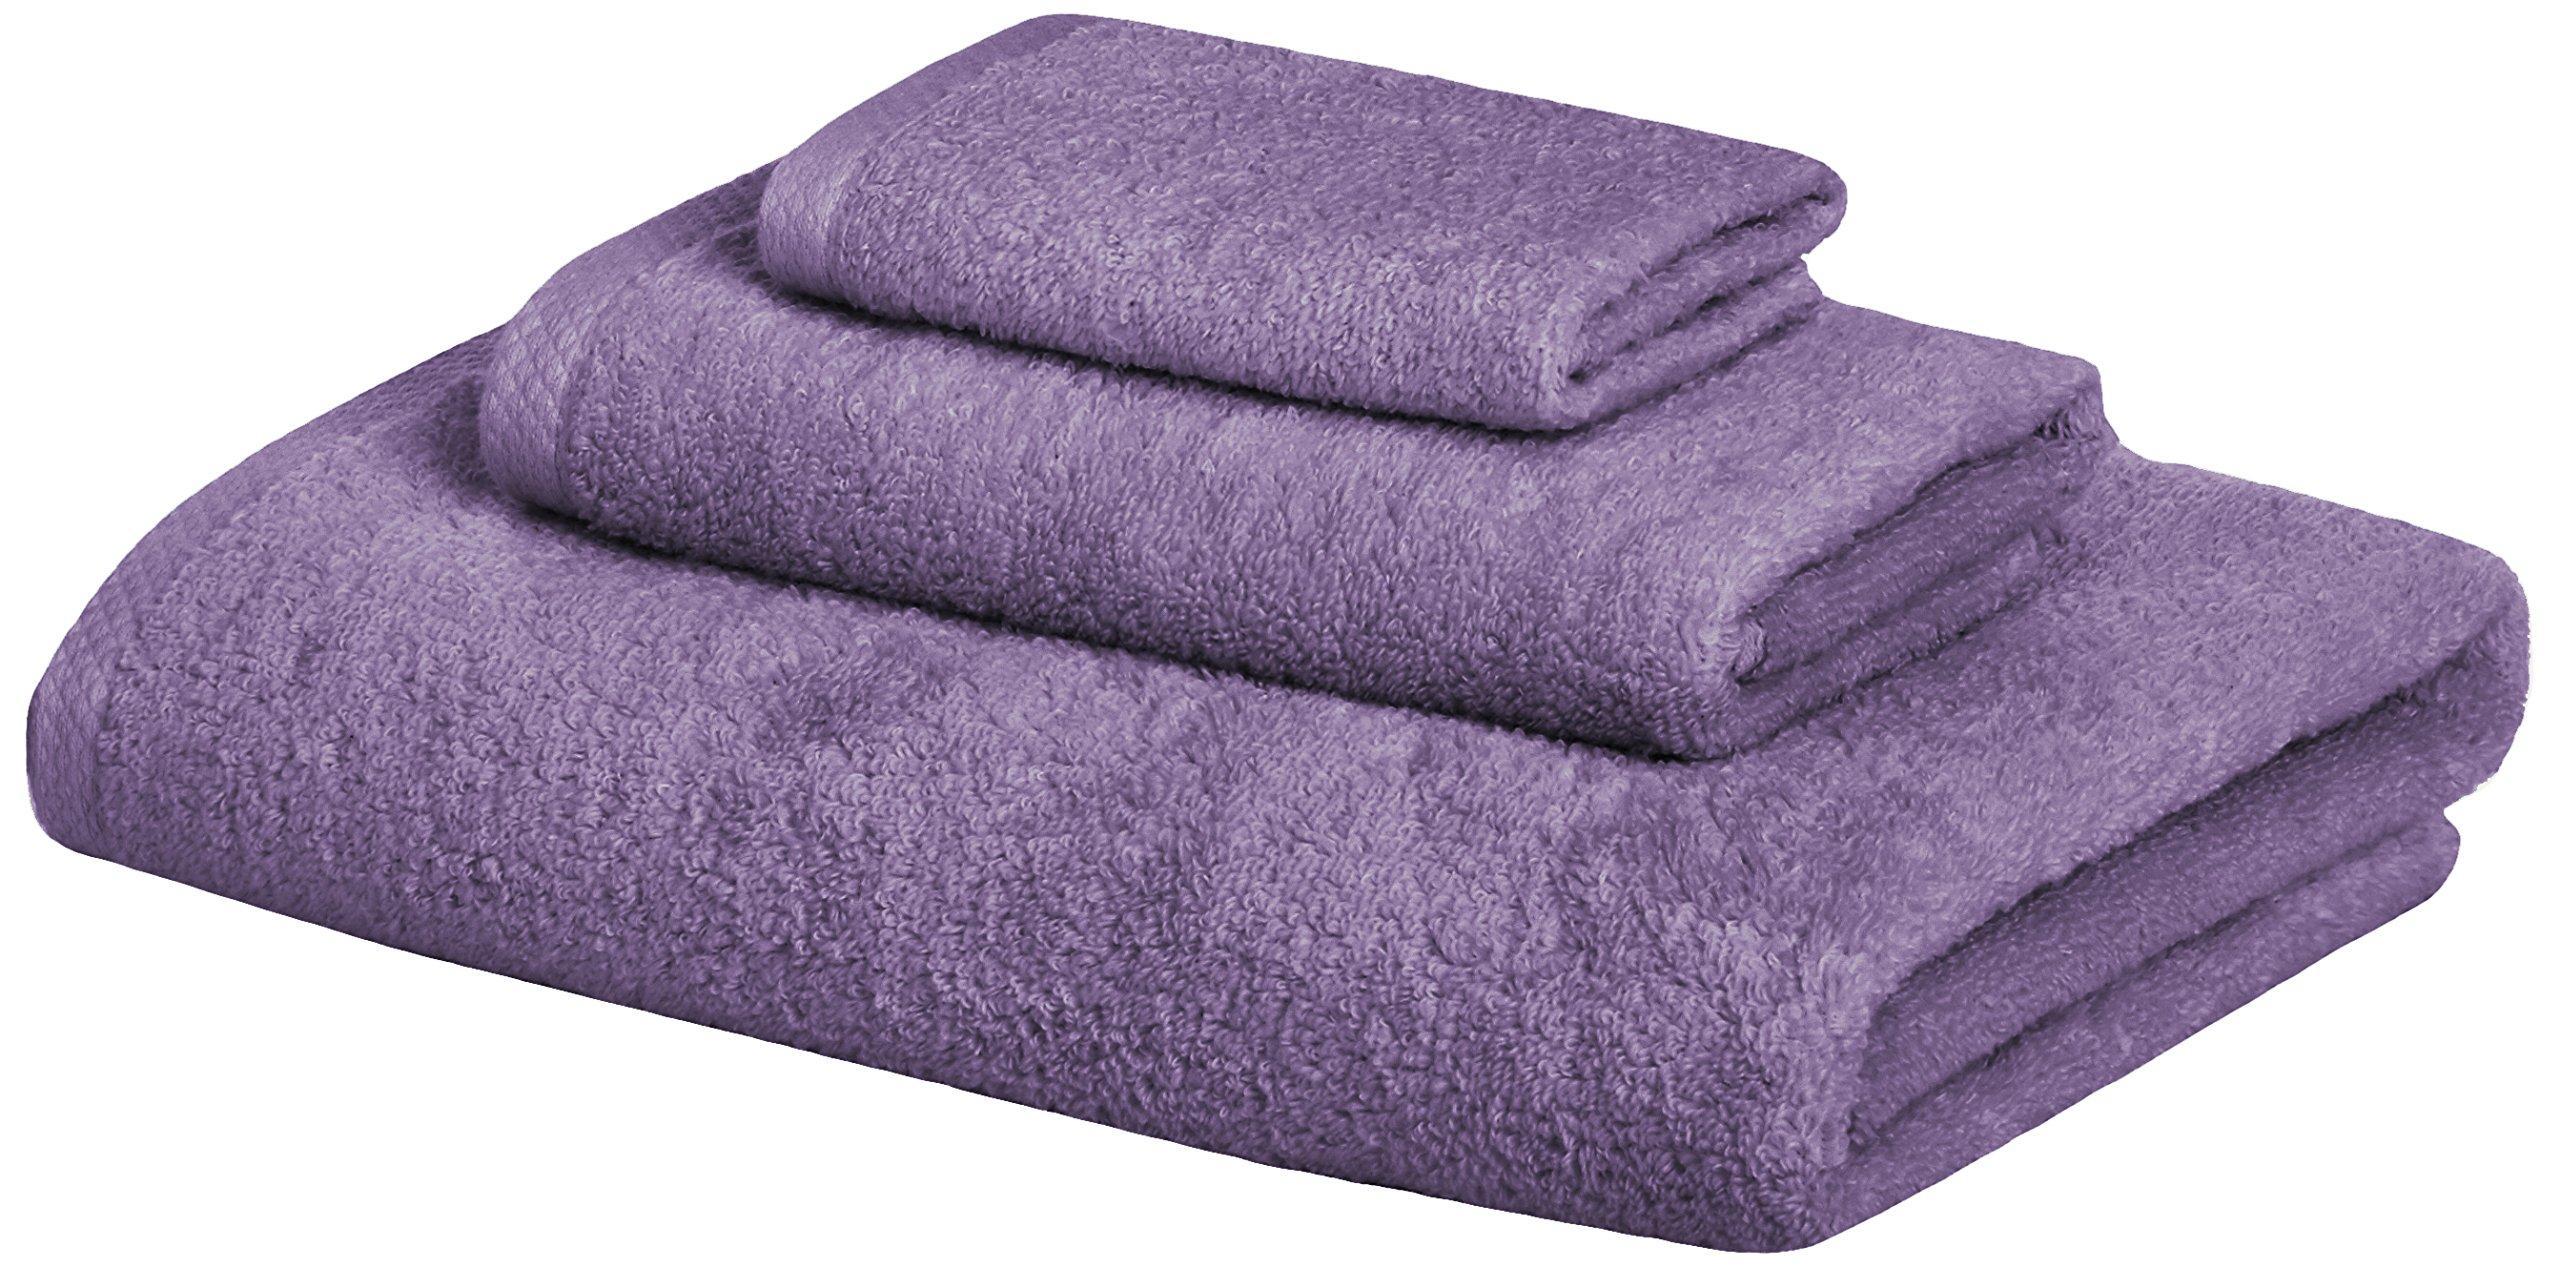 AmazonBasics Quick-Dry Towels - 100% Cotton, 3-Piece Set, Lavender by AmazonBasics